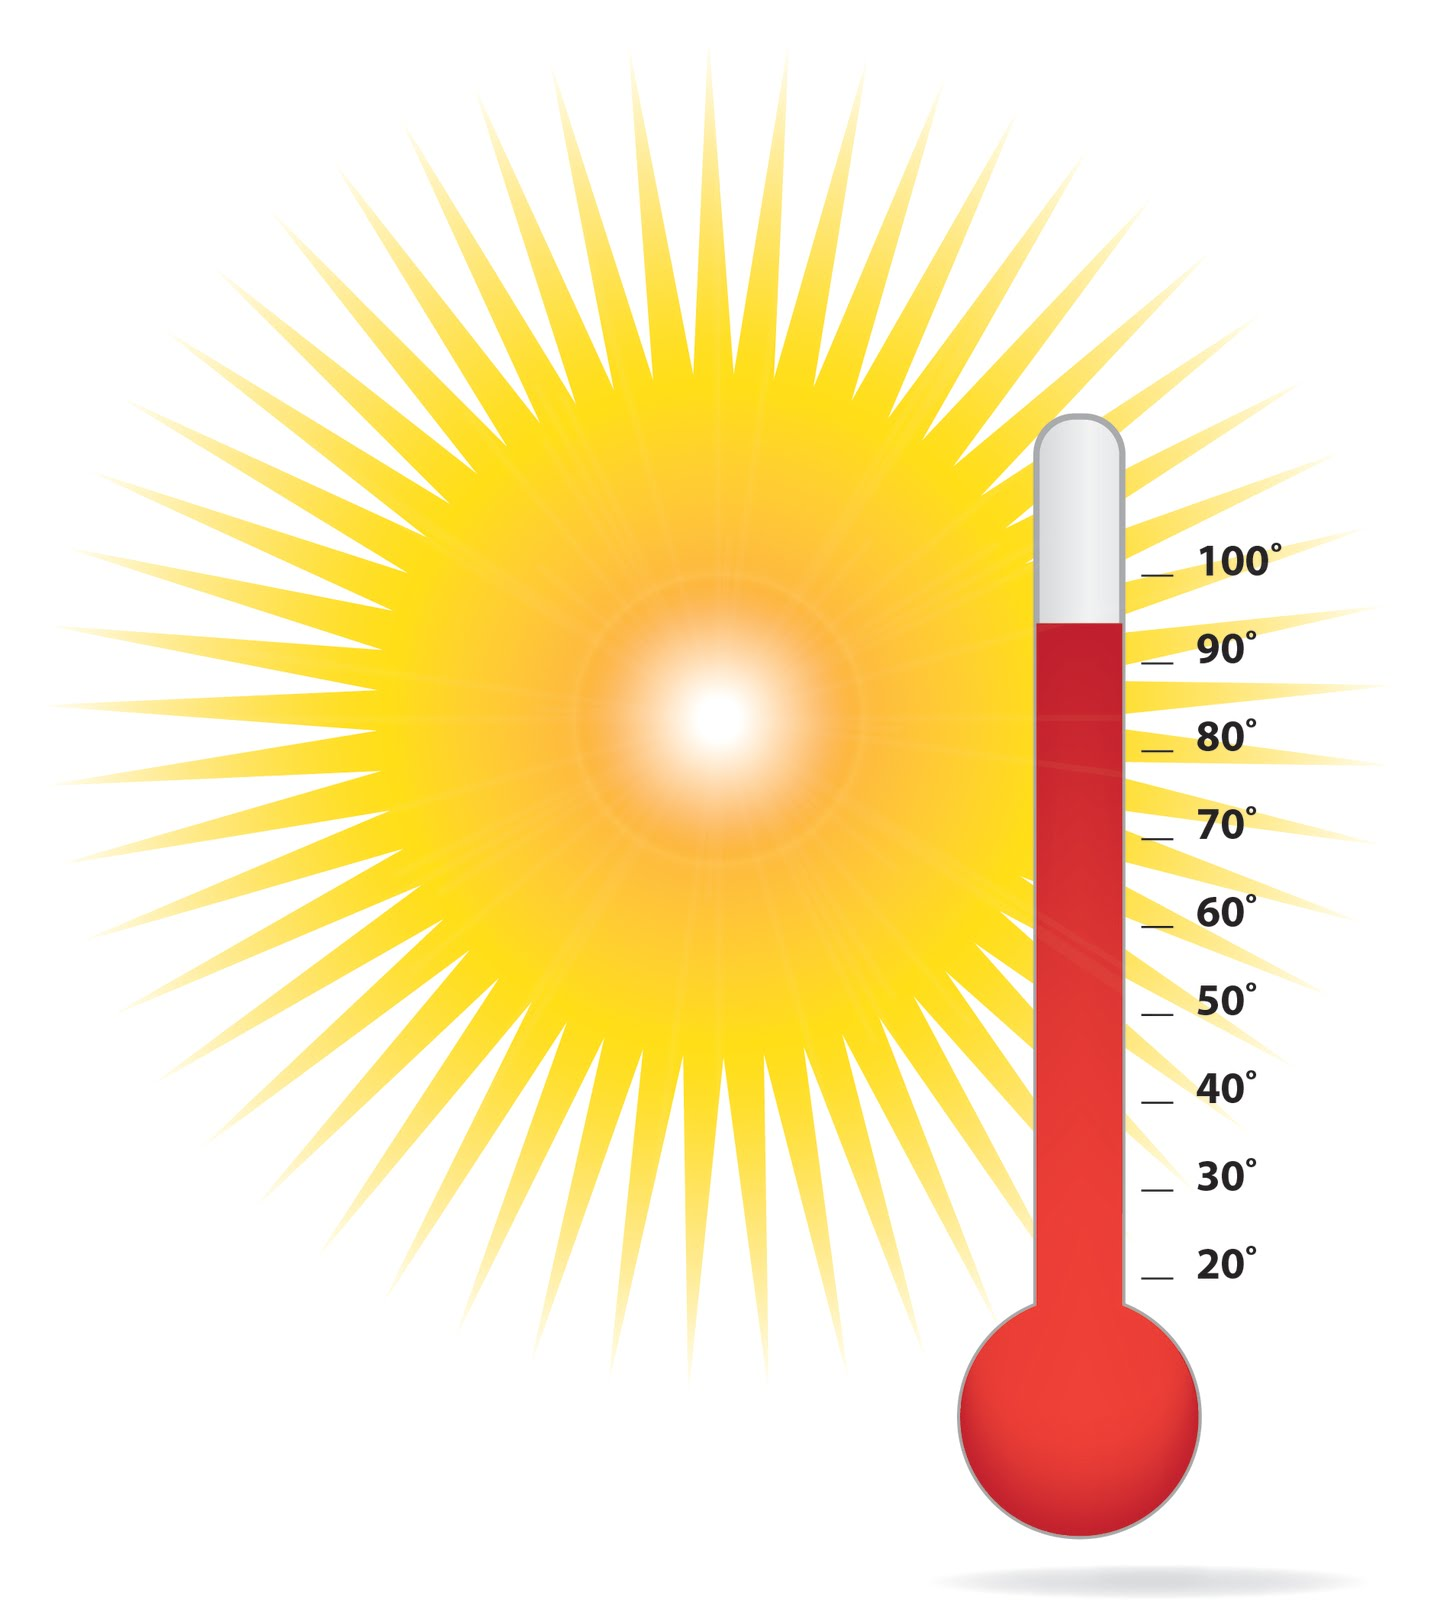 polycarbonate Heat resistance